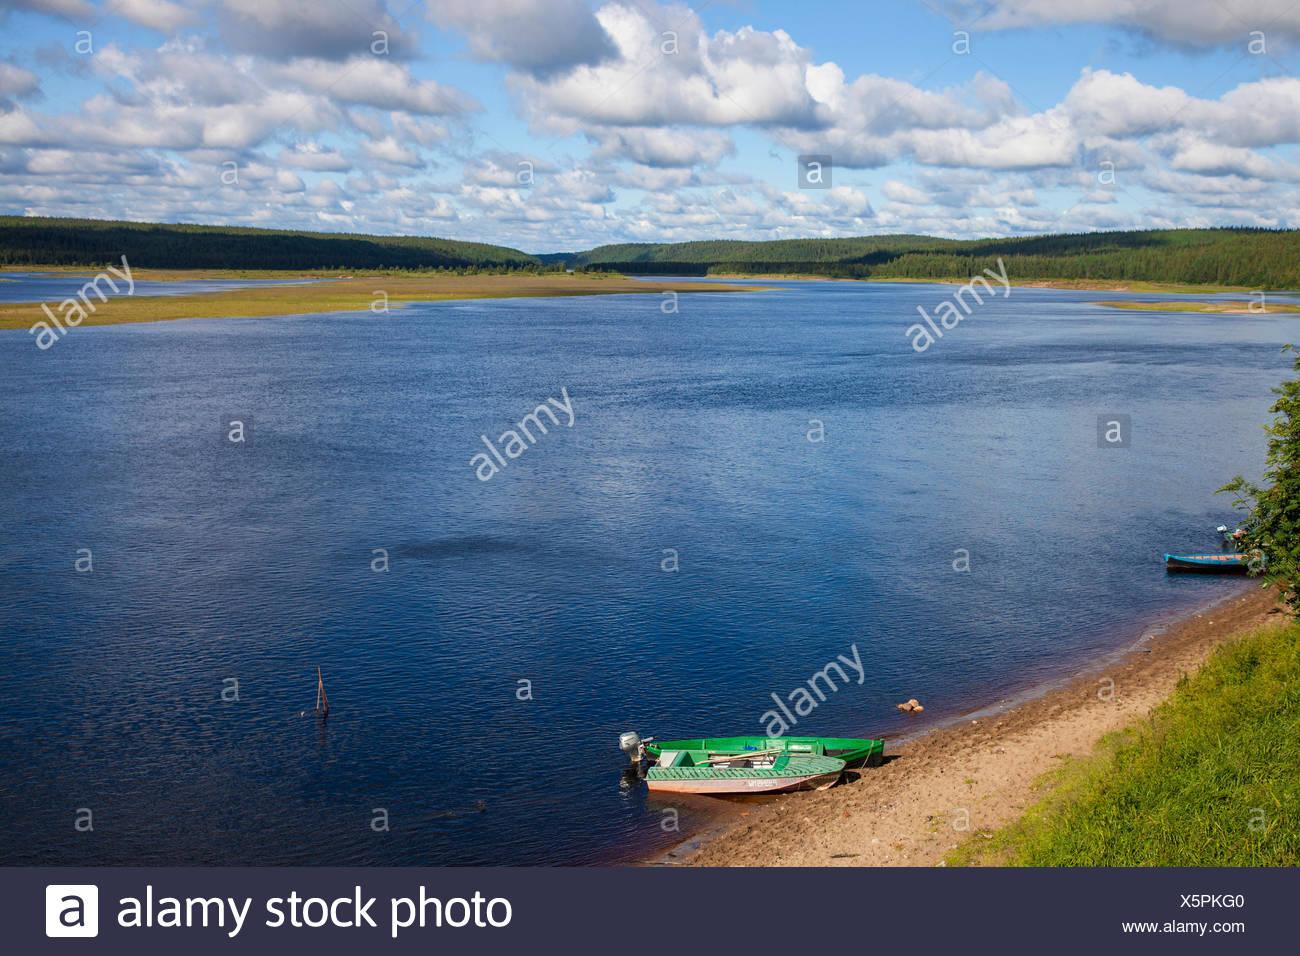 Varzuga River near Varzuga, Russia, Oblast Murmansk, Kola - Stock Image